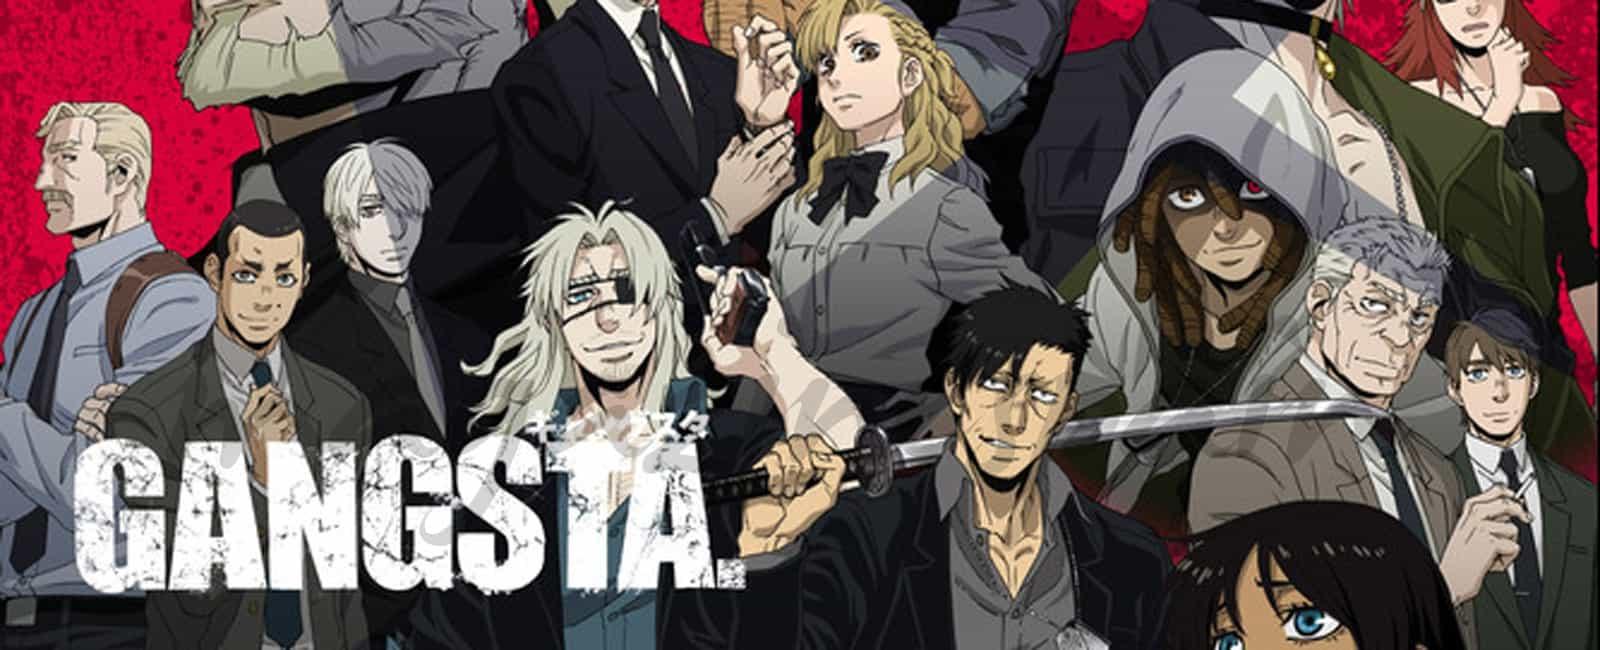 La serie japonesa «Gangsta» llega a España